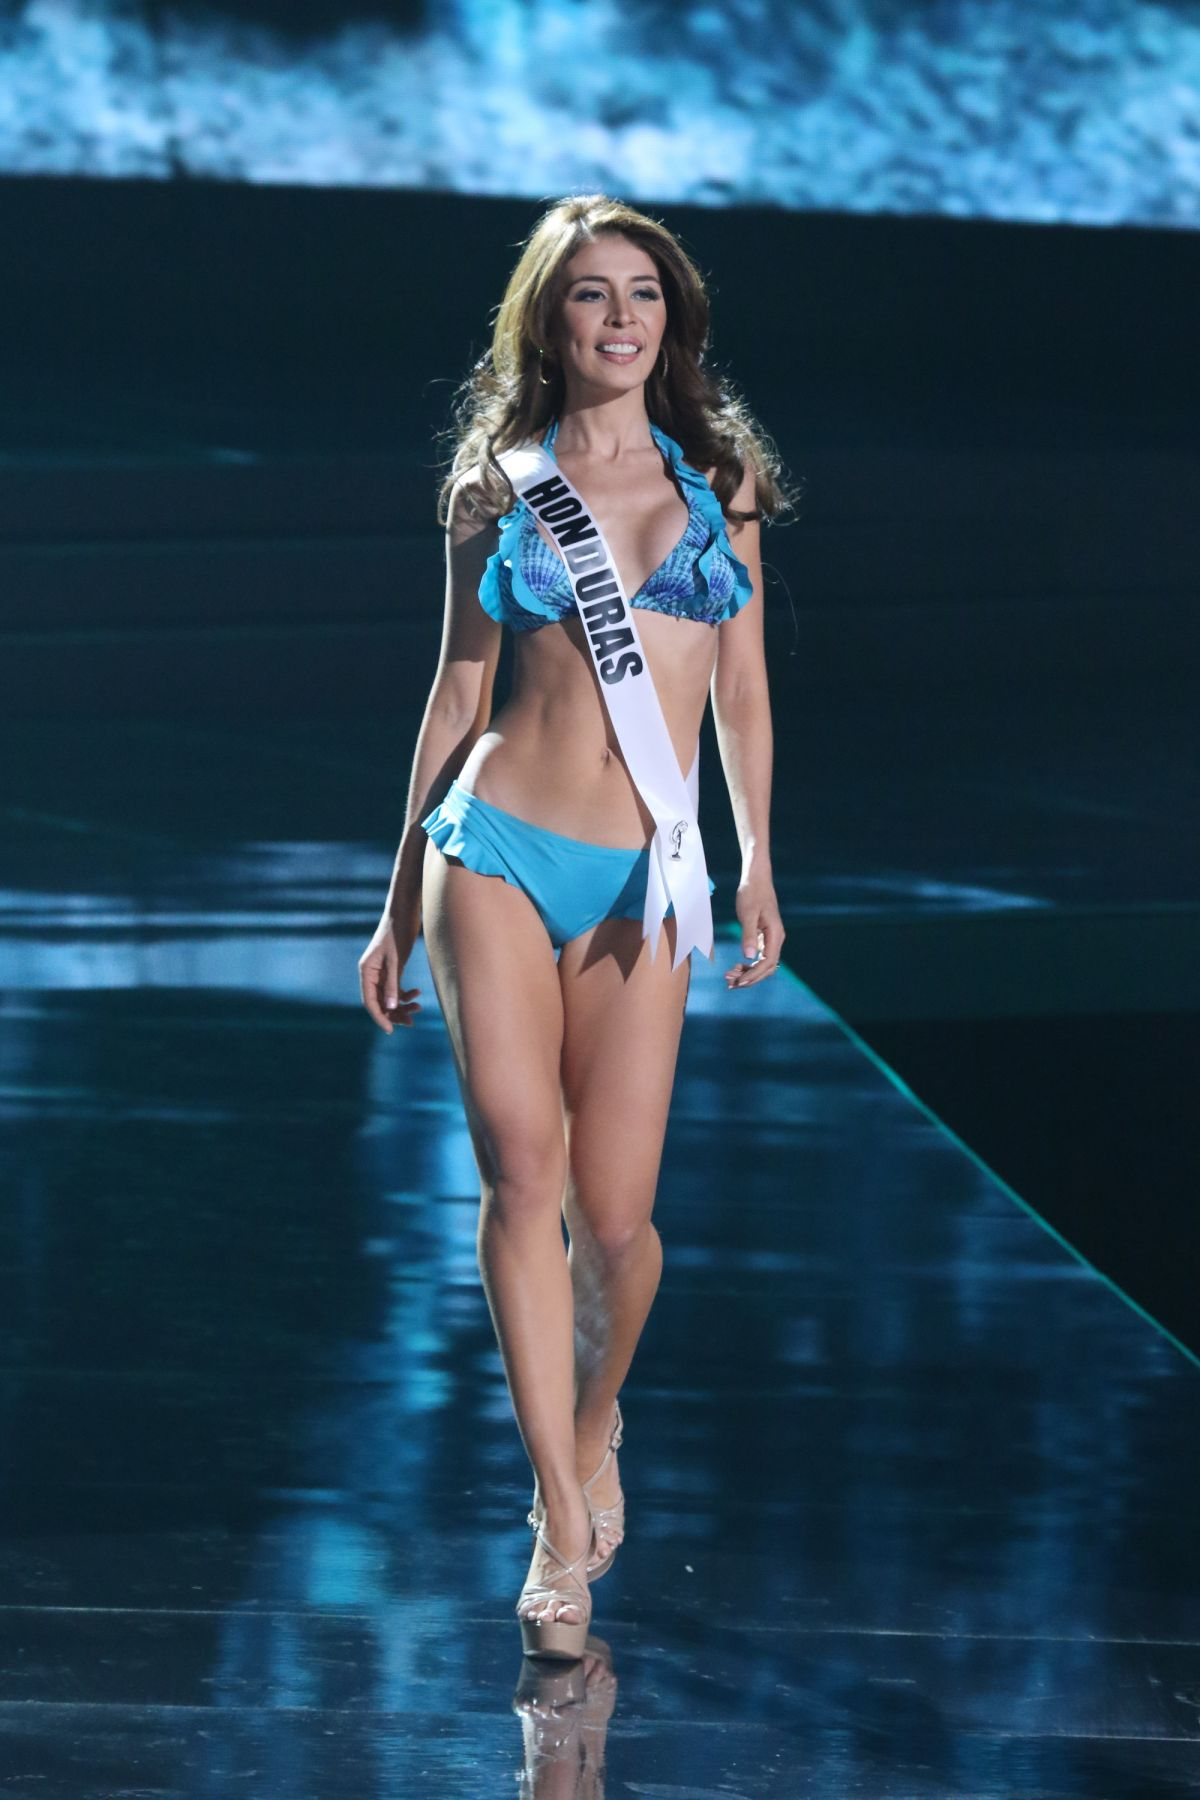 IROSHKA ELVIR - Miss Universe 2015 Preliminary Round 12/16/2015